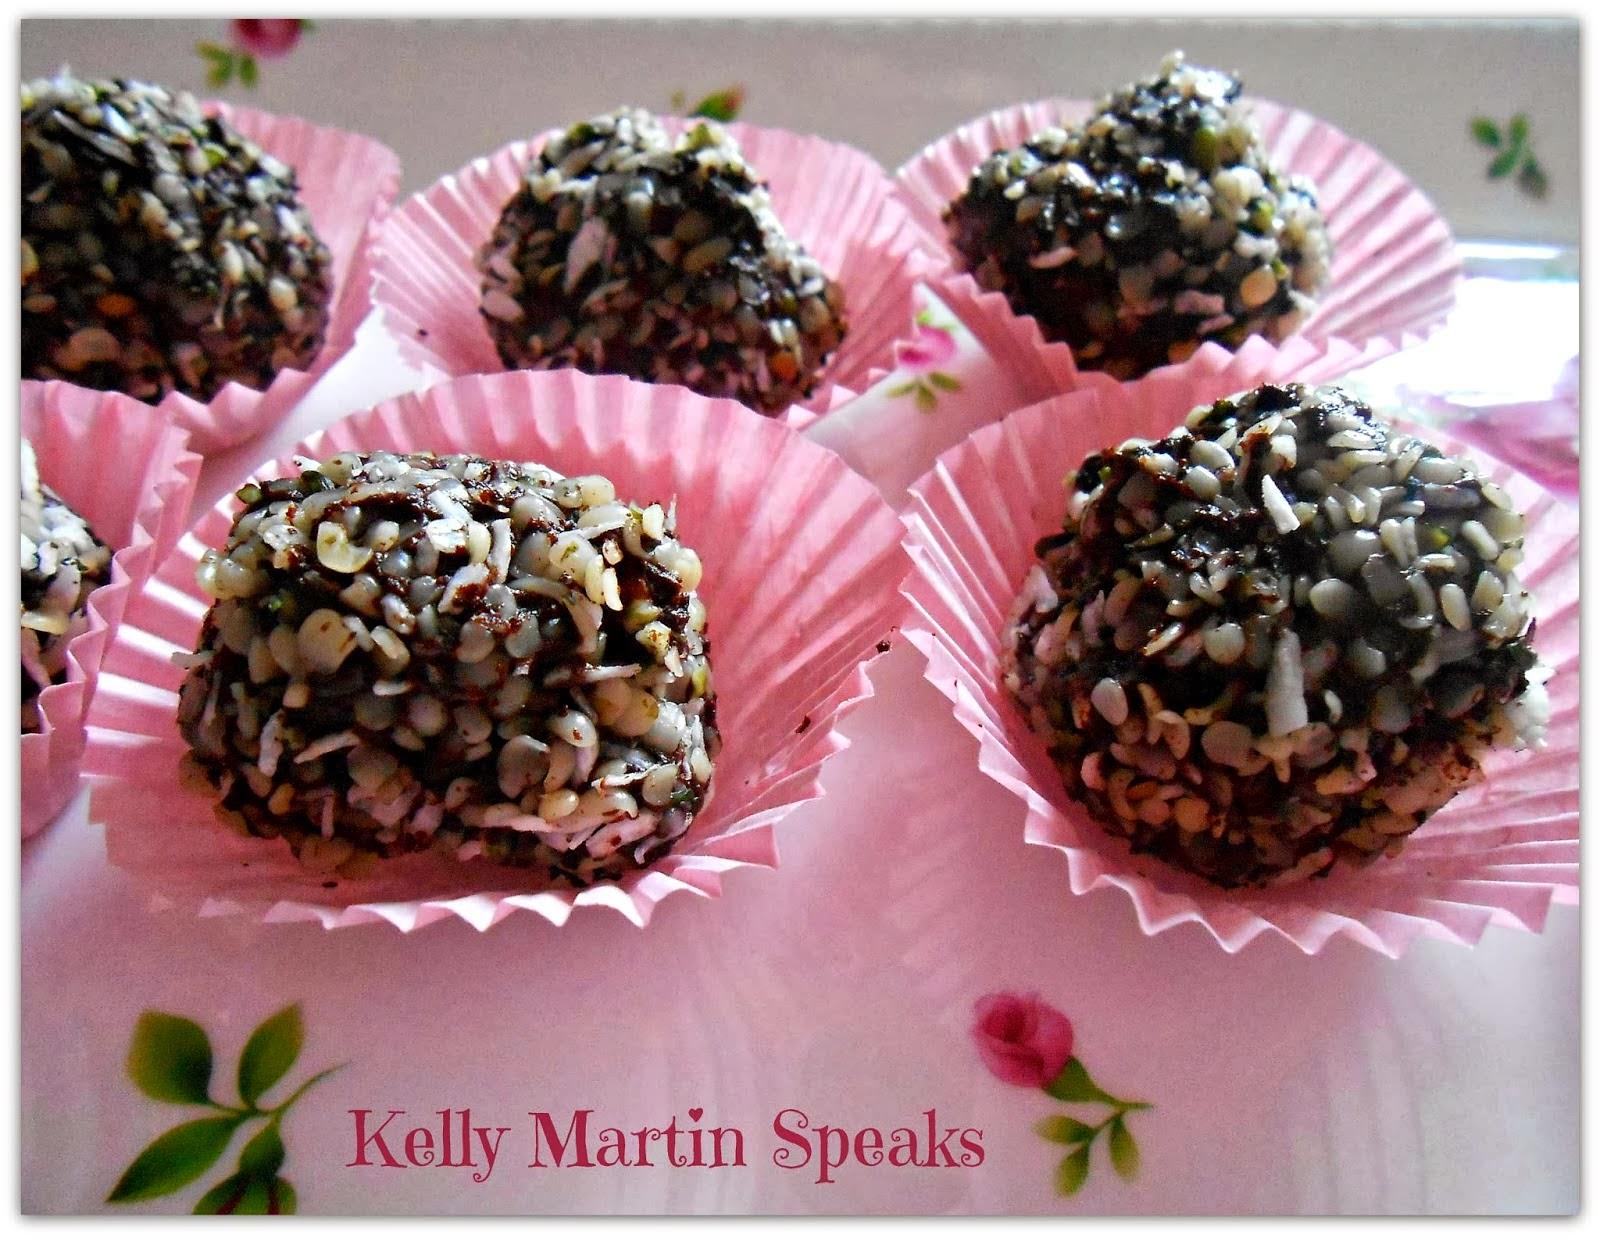 Hempseed Raw Chcolate Truffles